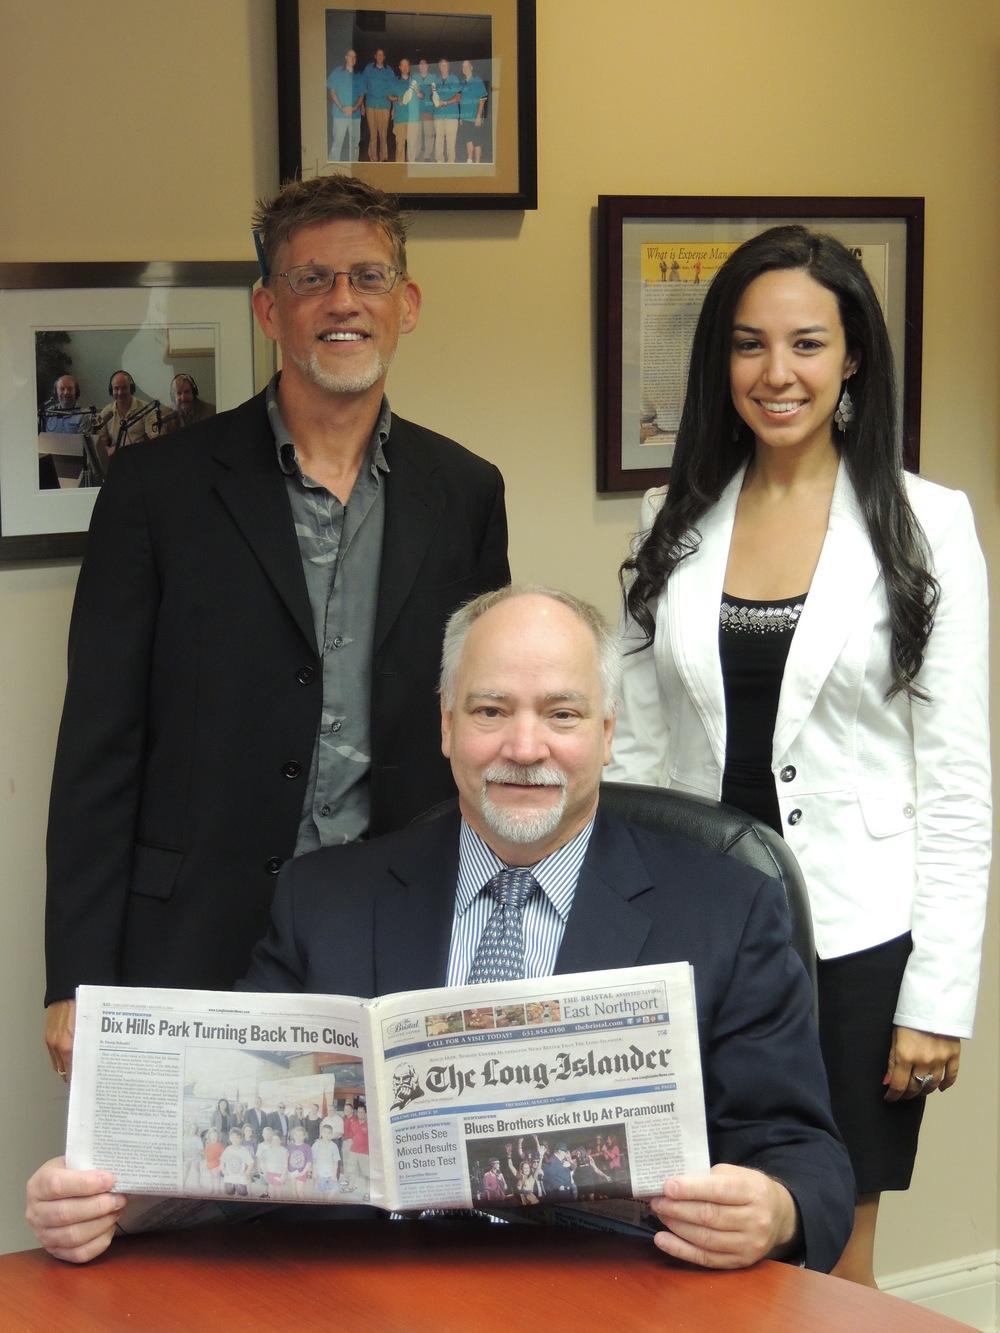 Jim Kelly (front), Peter Sloggatt (back left), and Luann Dallojacono (back right) pose for a photo.